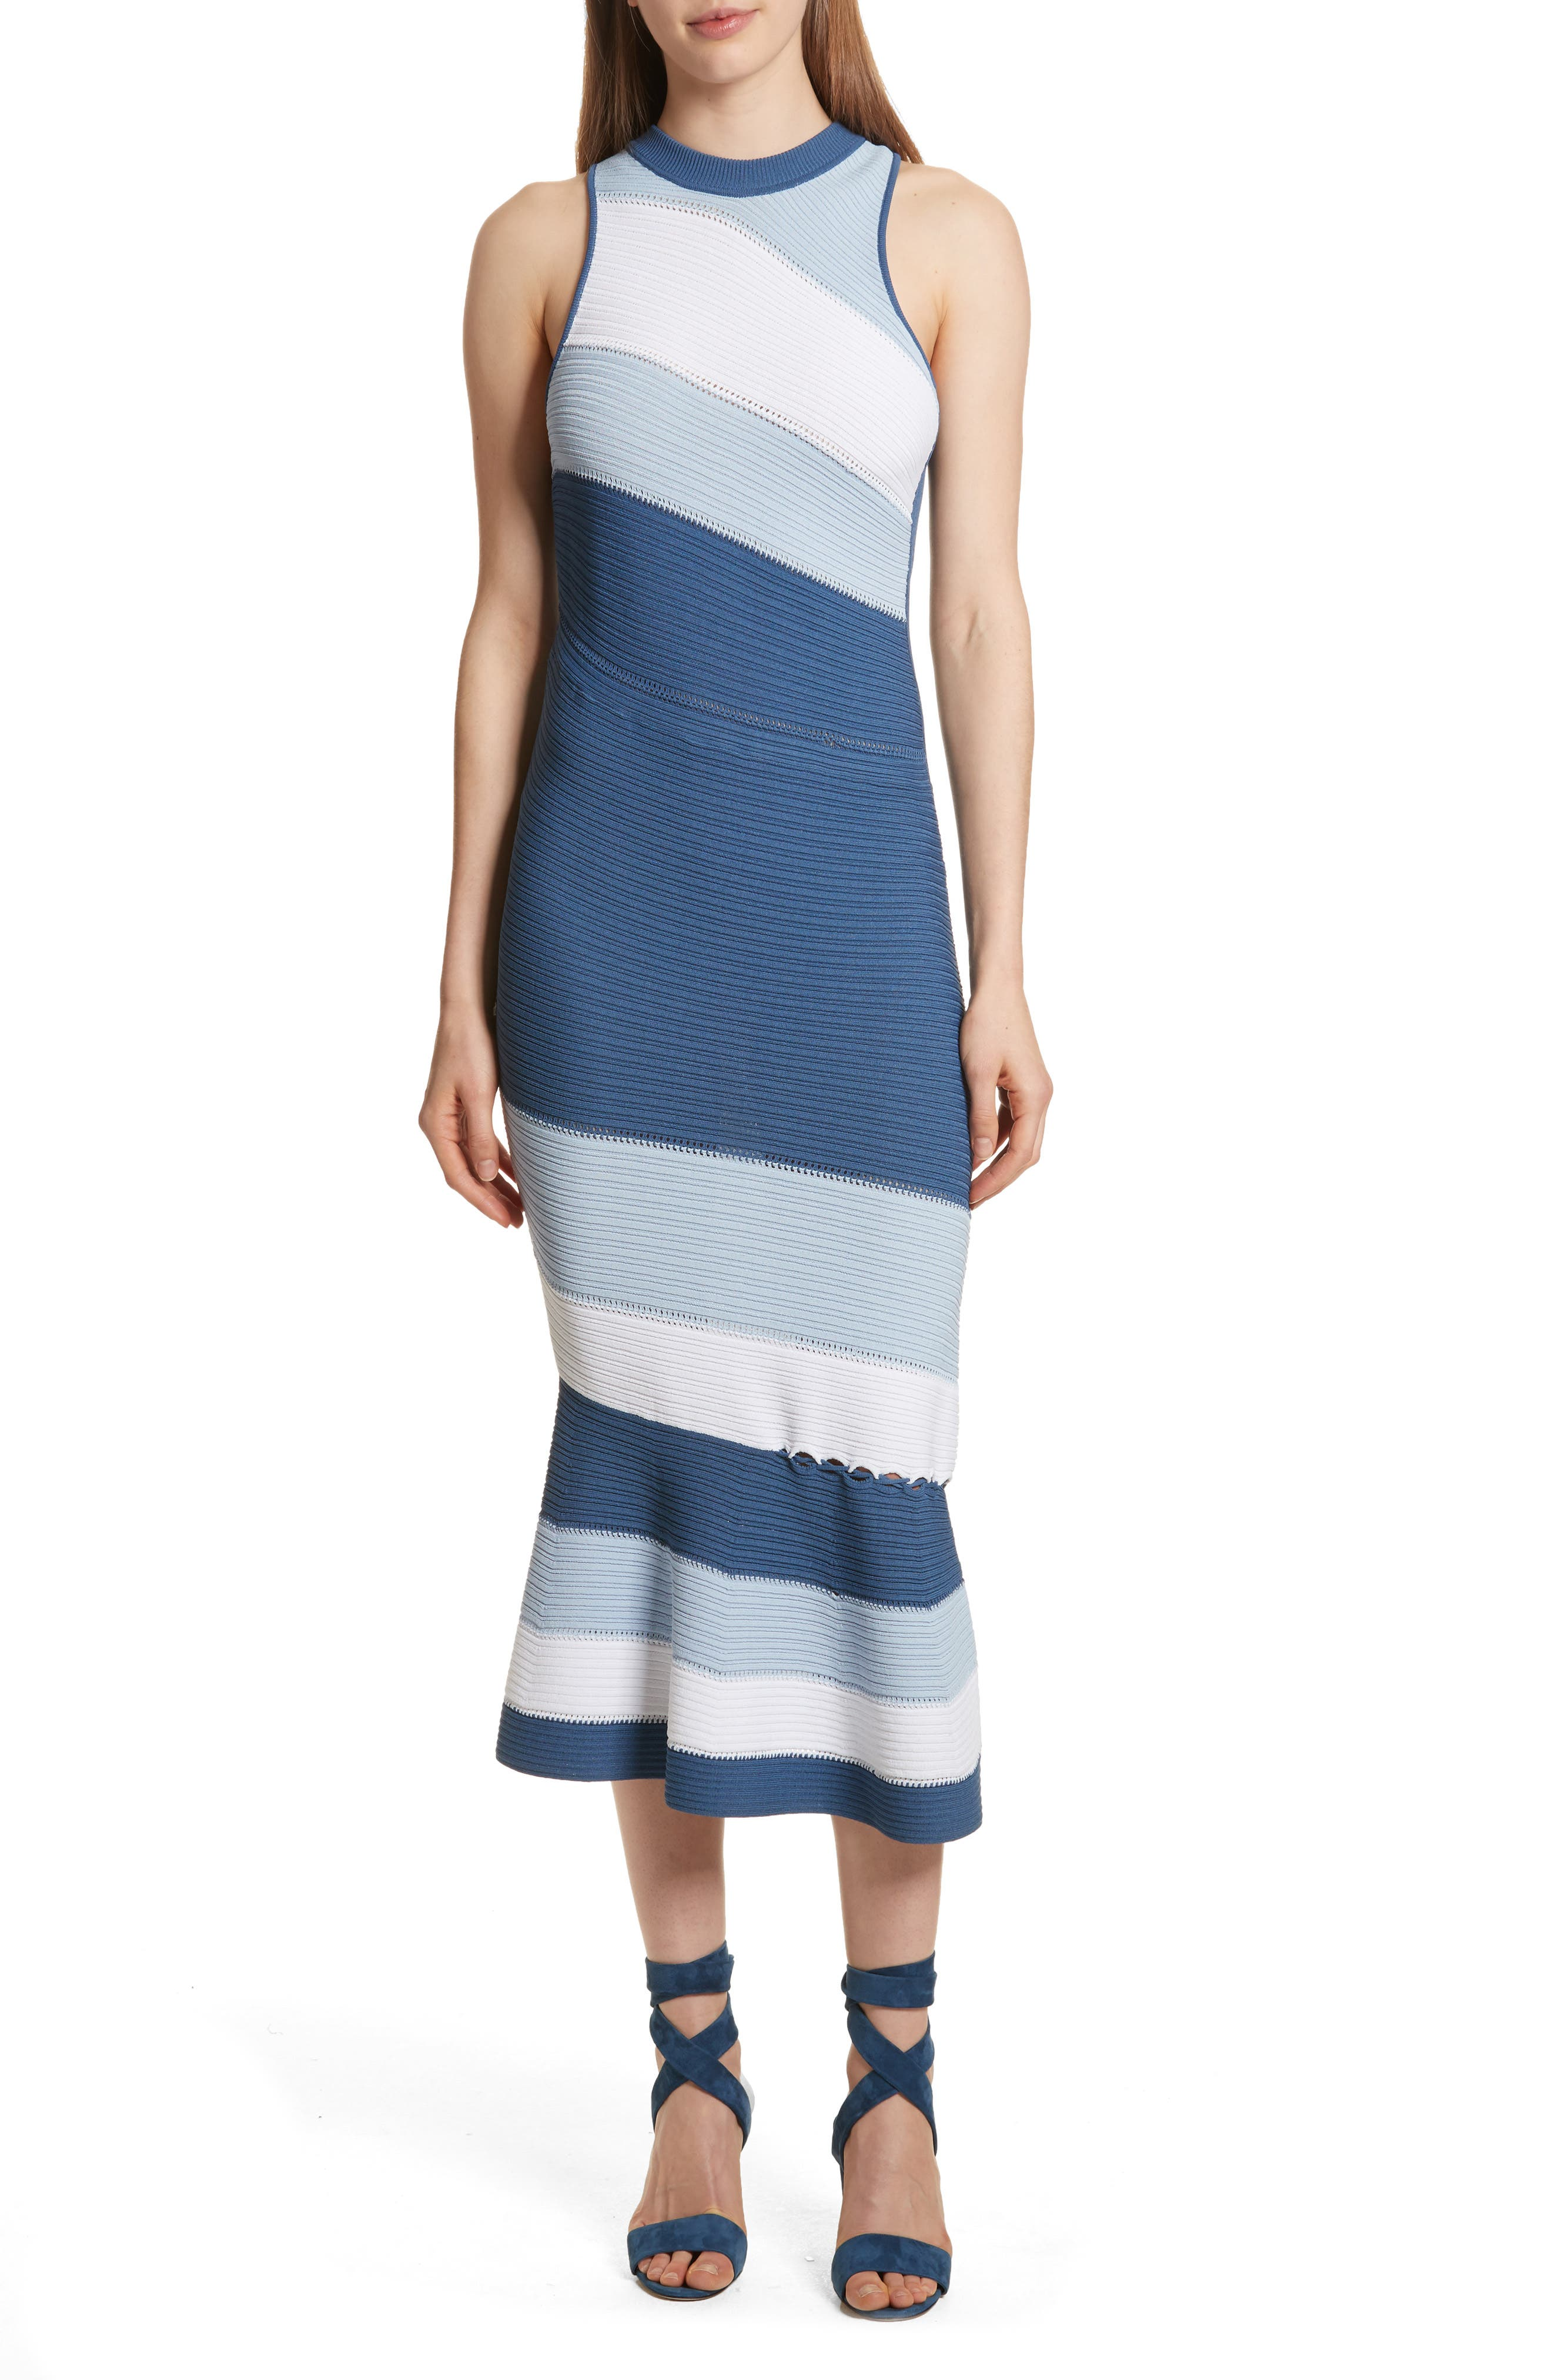 Linked Asymmetrical Dress,                             Main thumbnail 1, color,                             Blue Combo